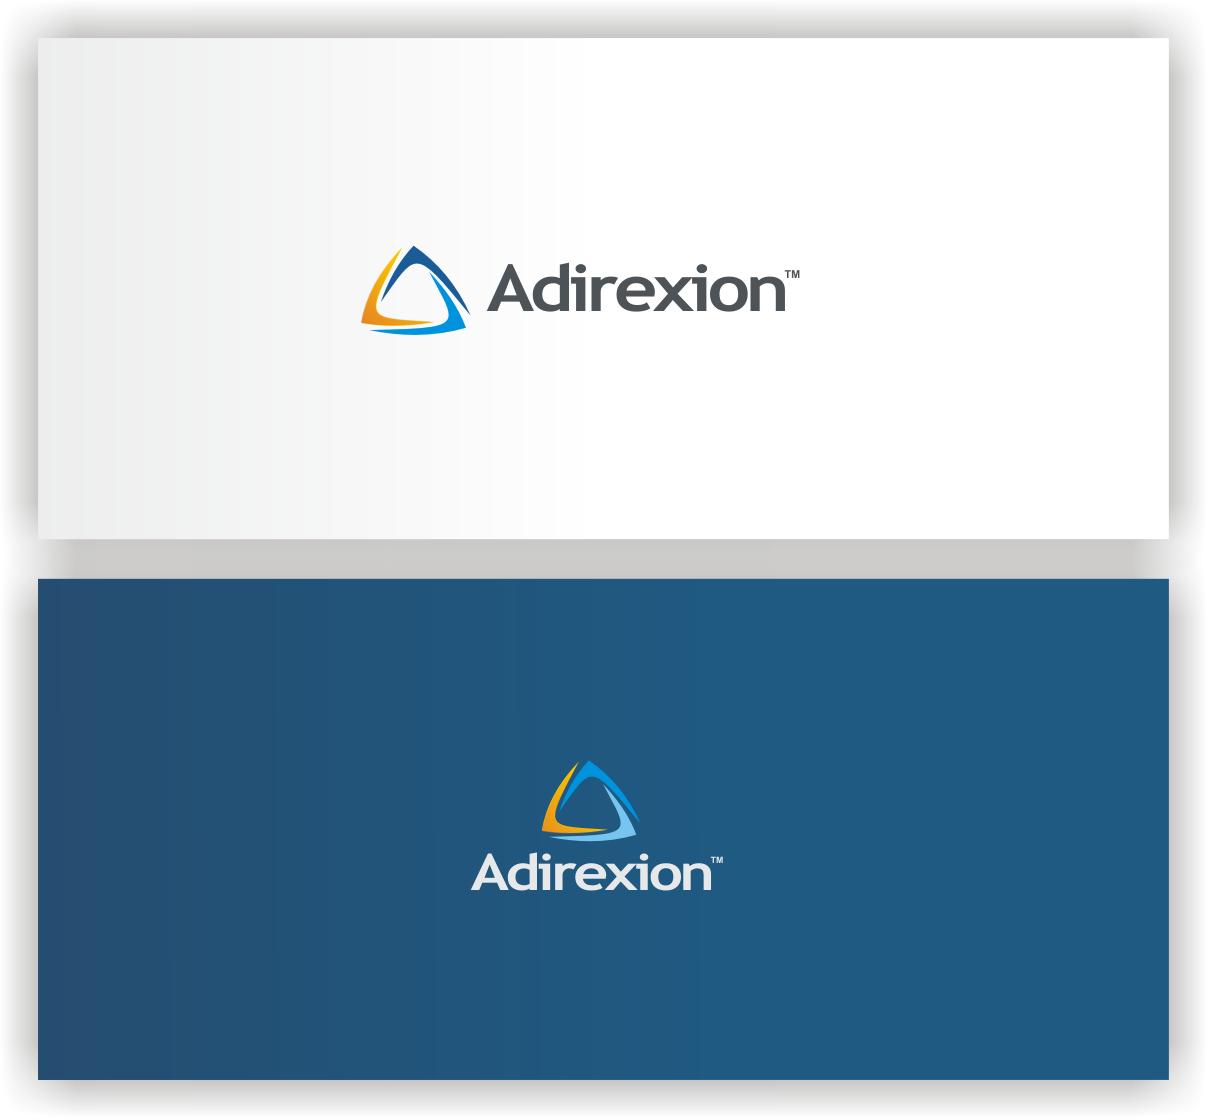 Adirexion needs a good logo